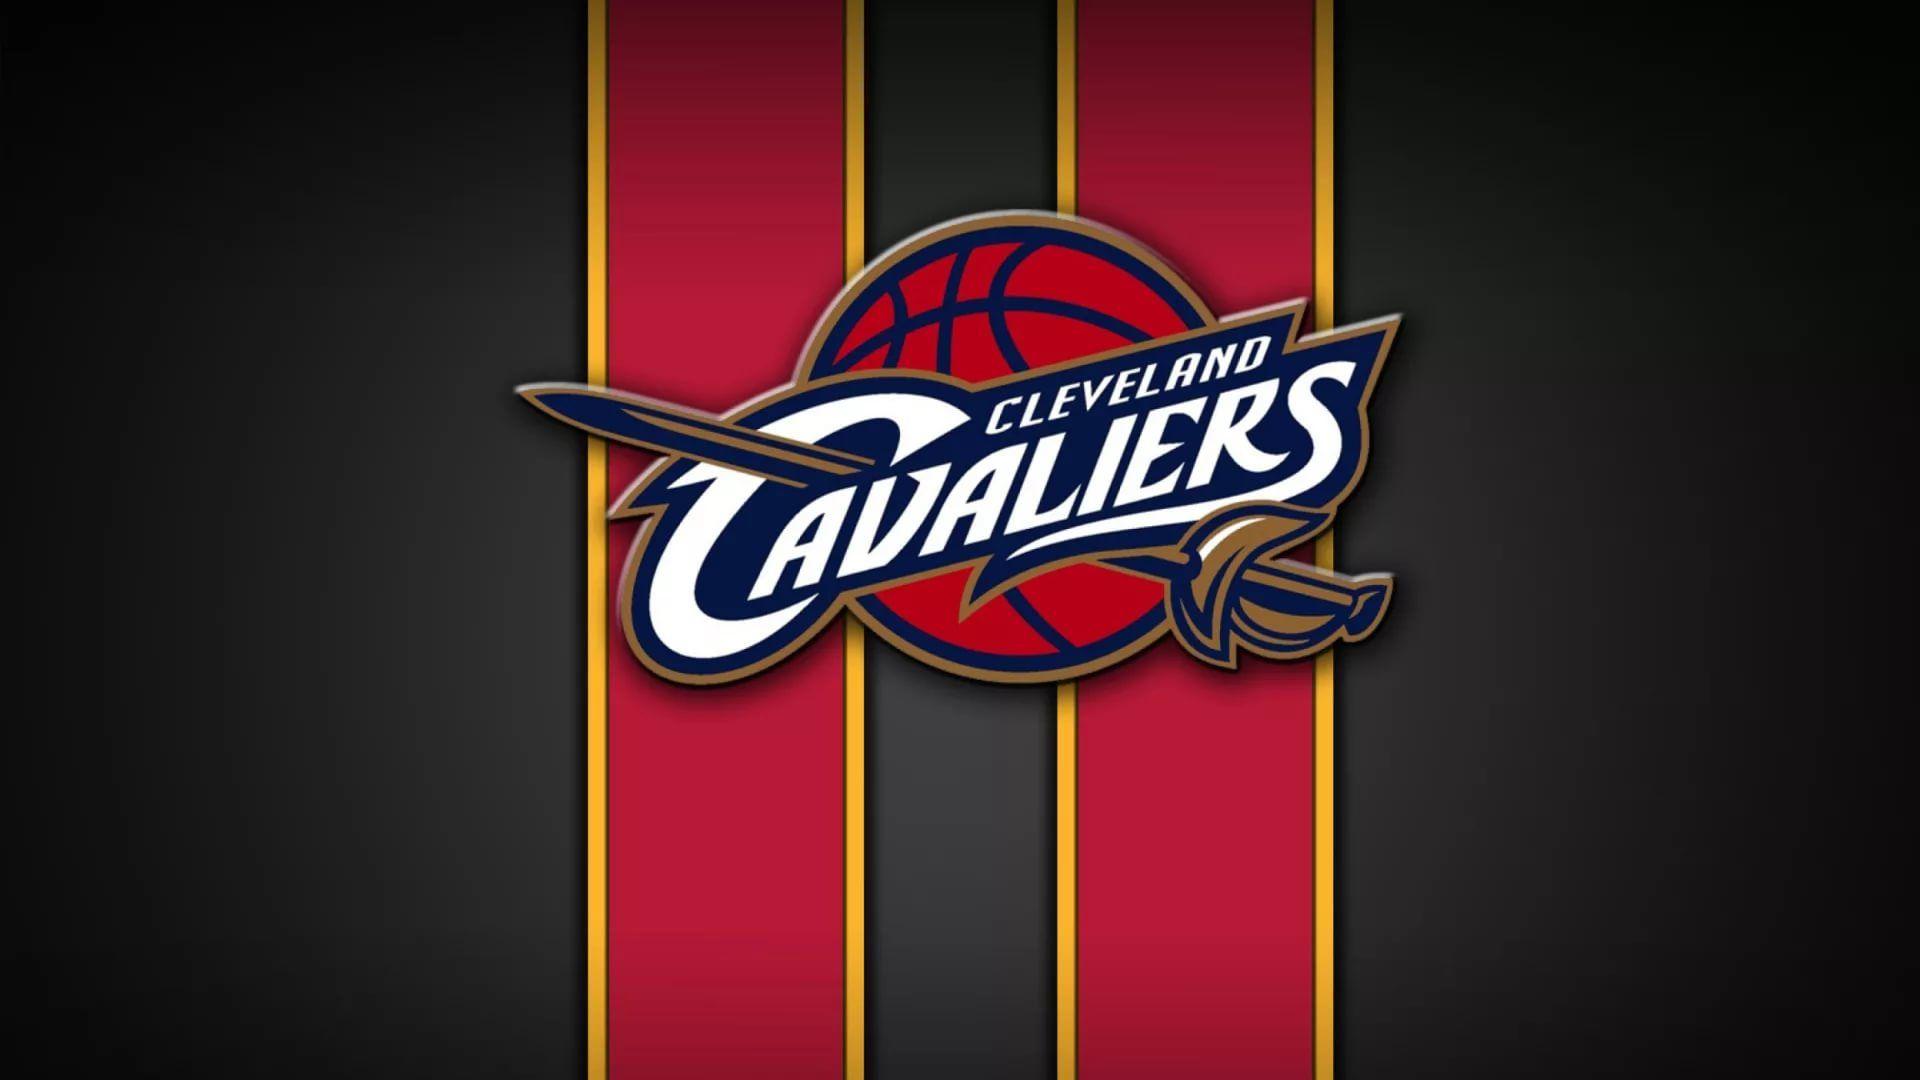 Cleveland wallpaper photo